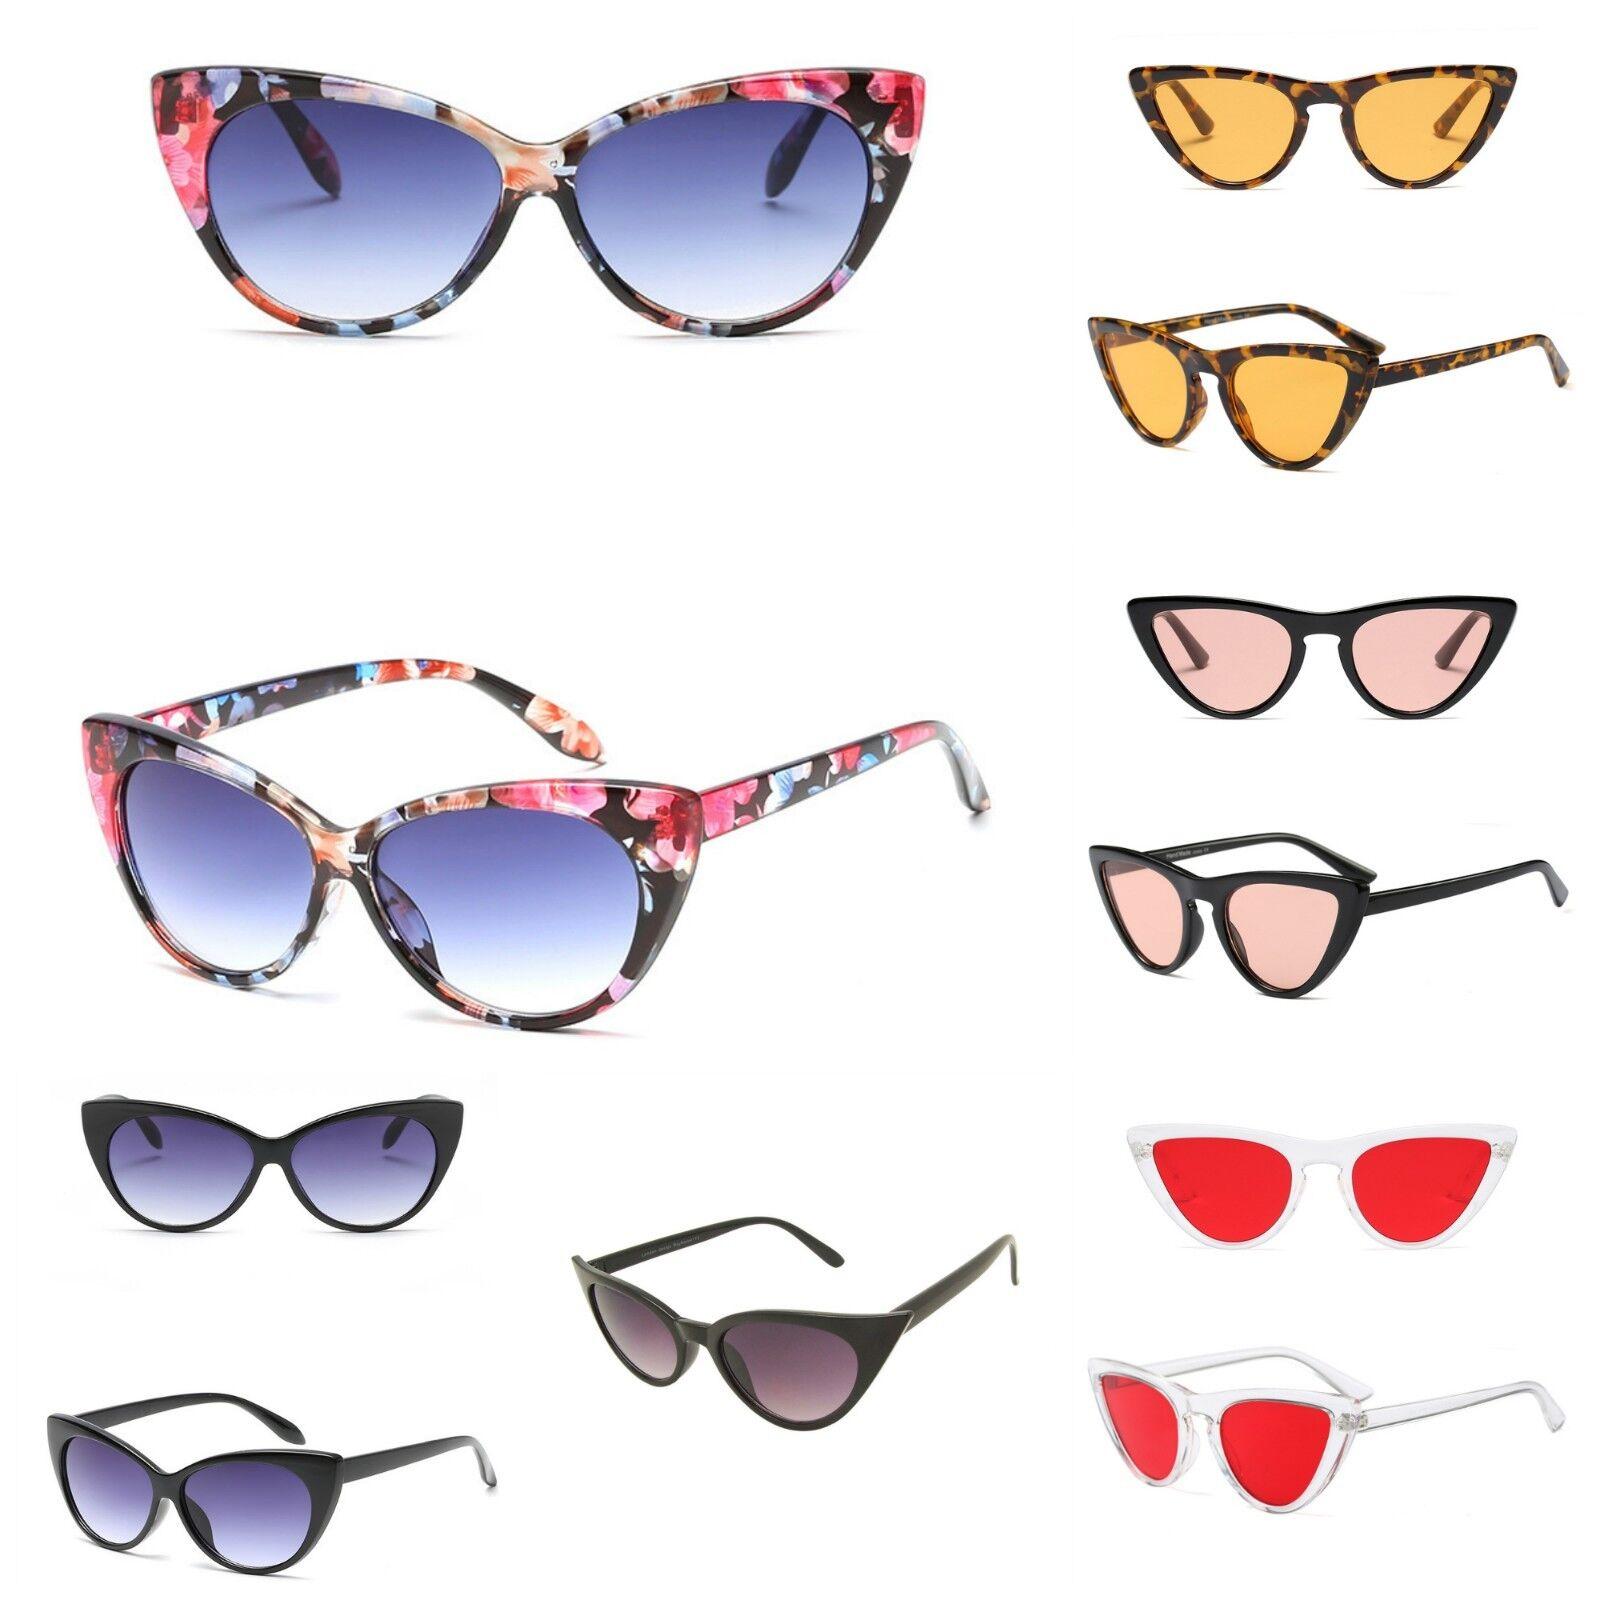 0ad9a0cdf48f Cat Eye Sunglasses Ebay Uk - Restaurant and Palinka Bar